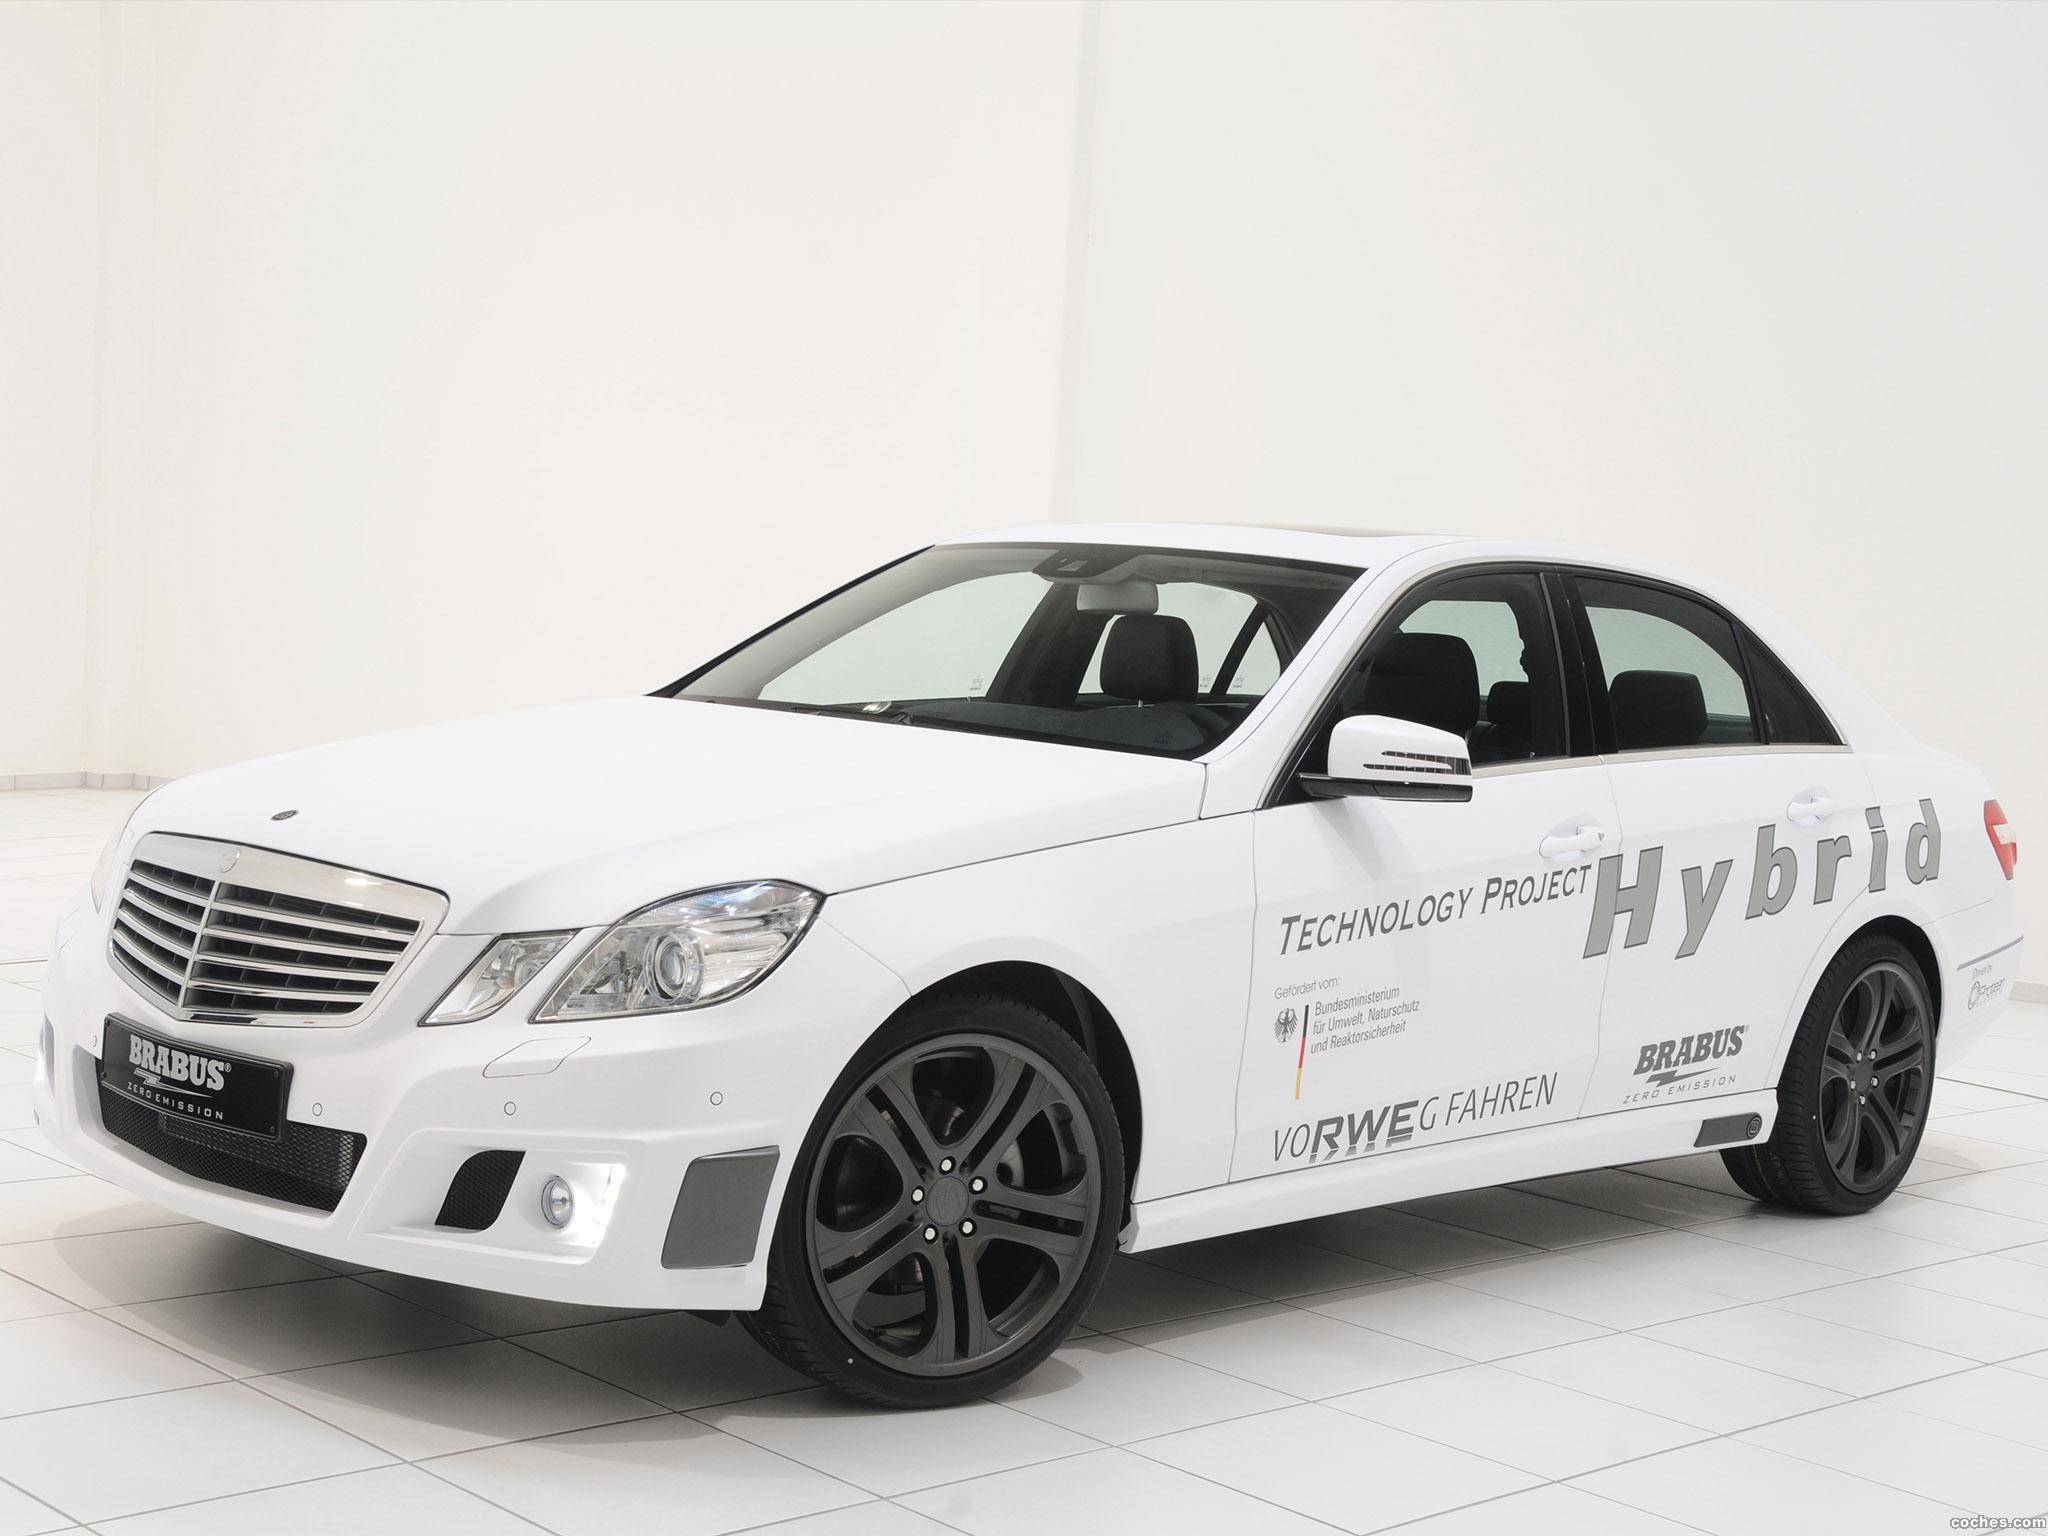 Foto 0 de Brabus Mercedes Clase E Technologie Projekt Hybrid 2011